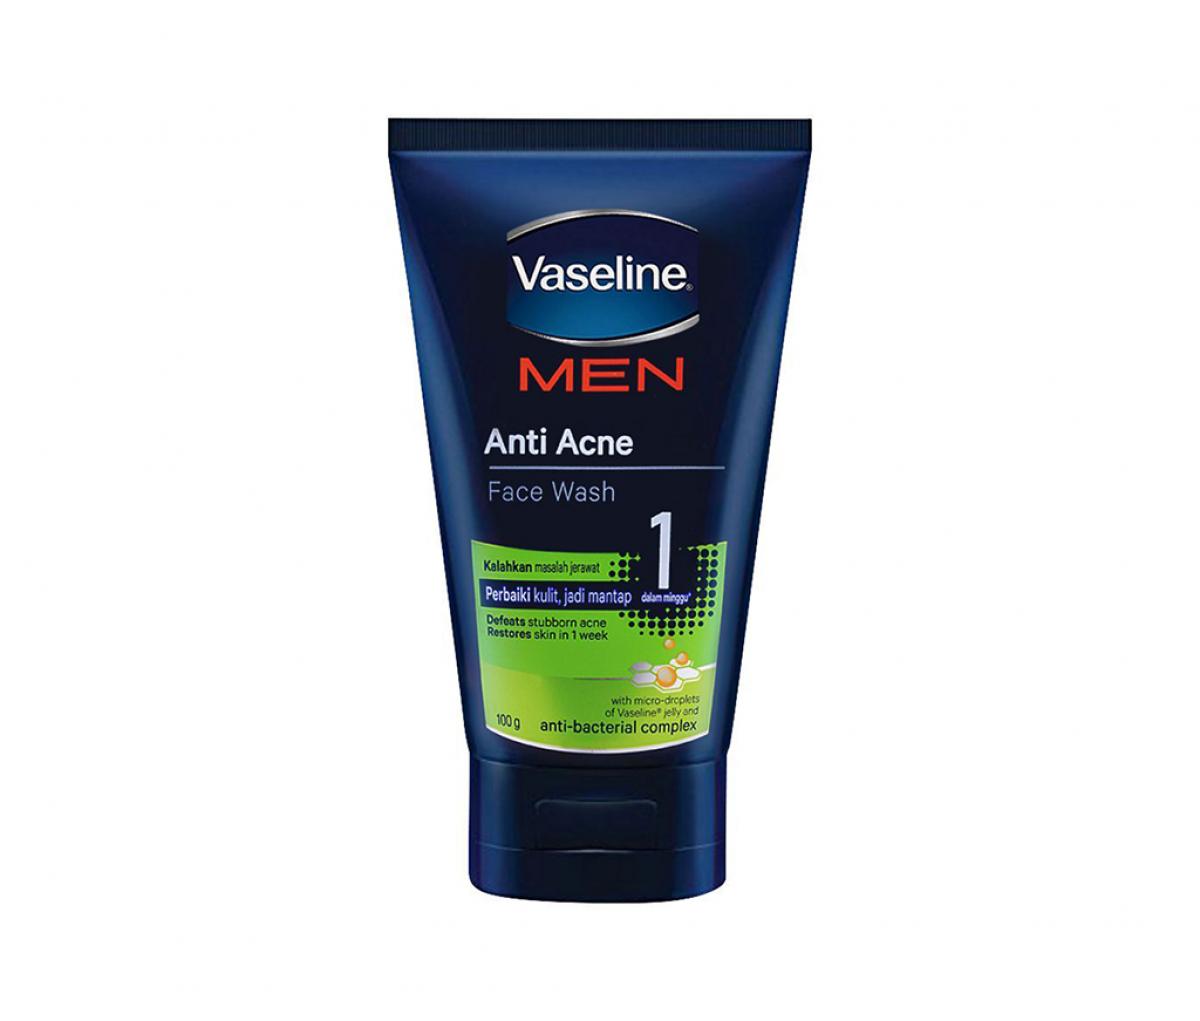 Vaseline  Men Anti Acne Face Wash